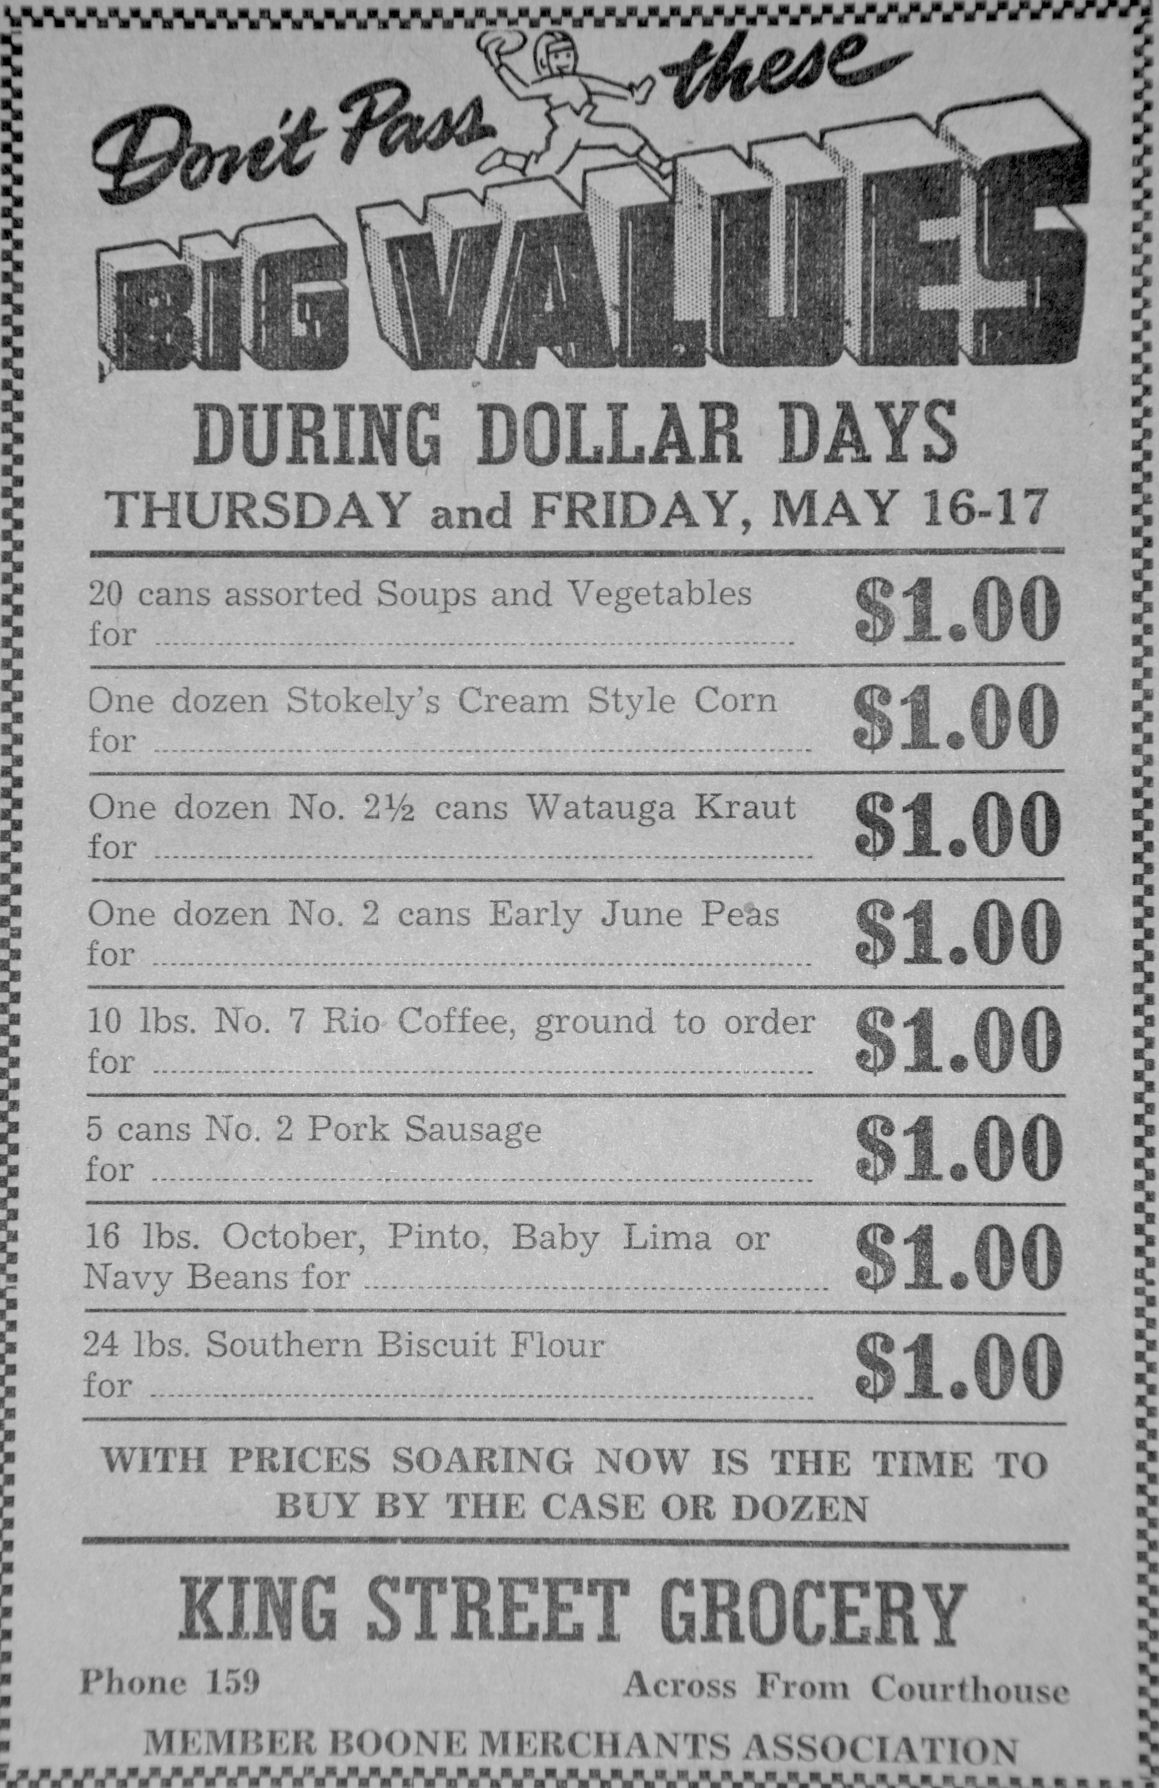 1941 advertisement